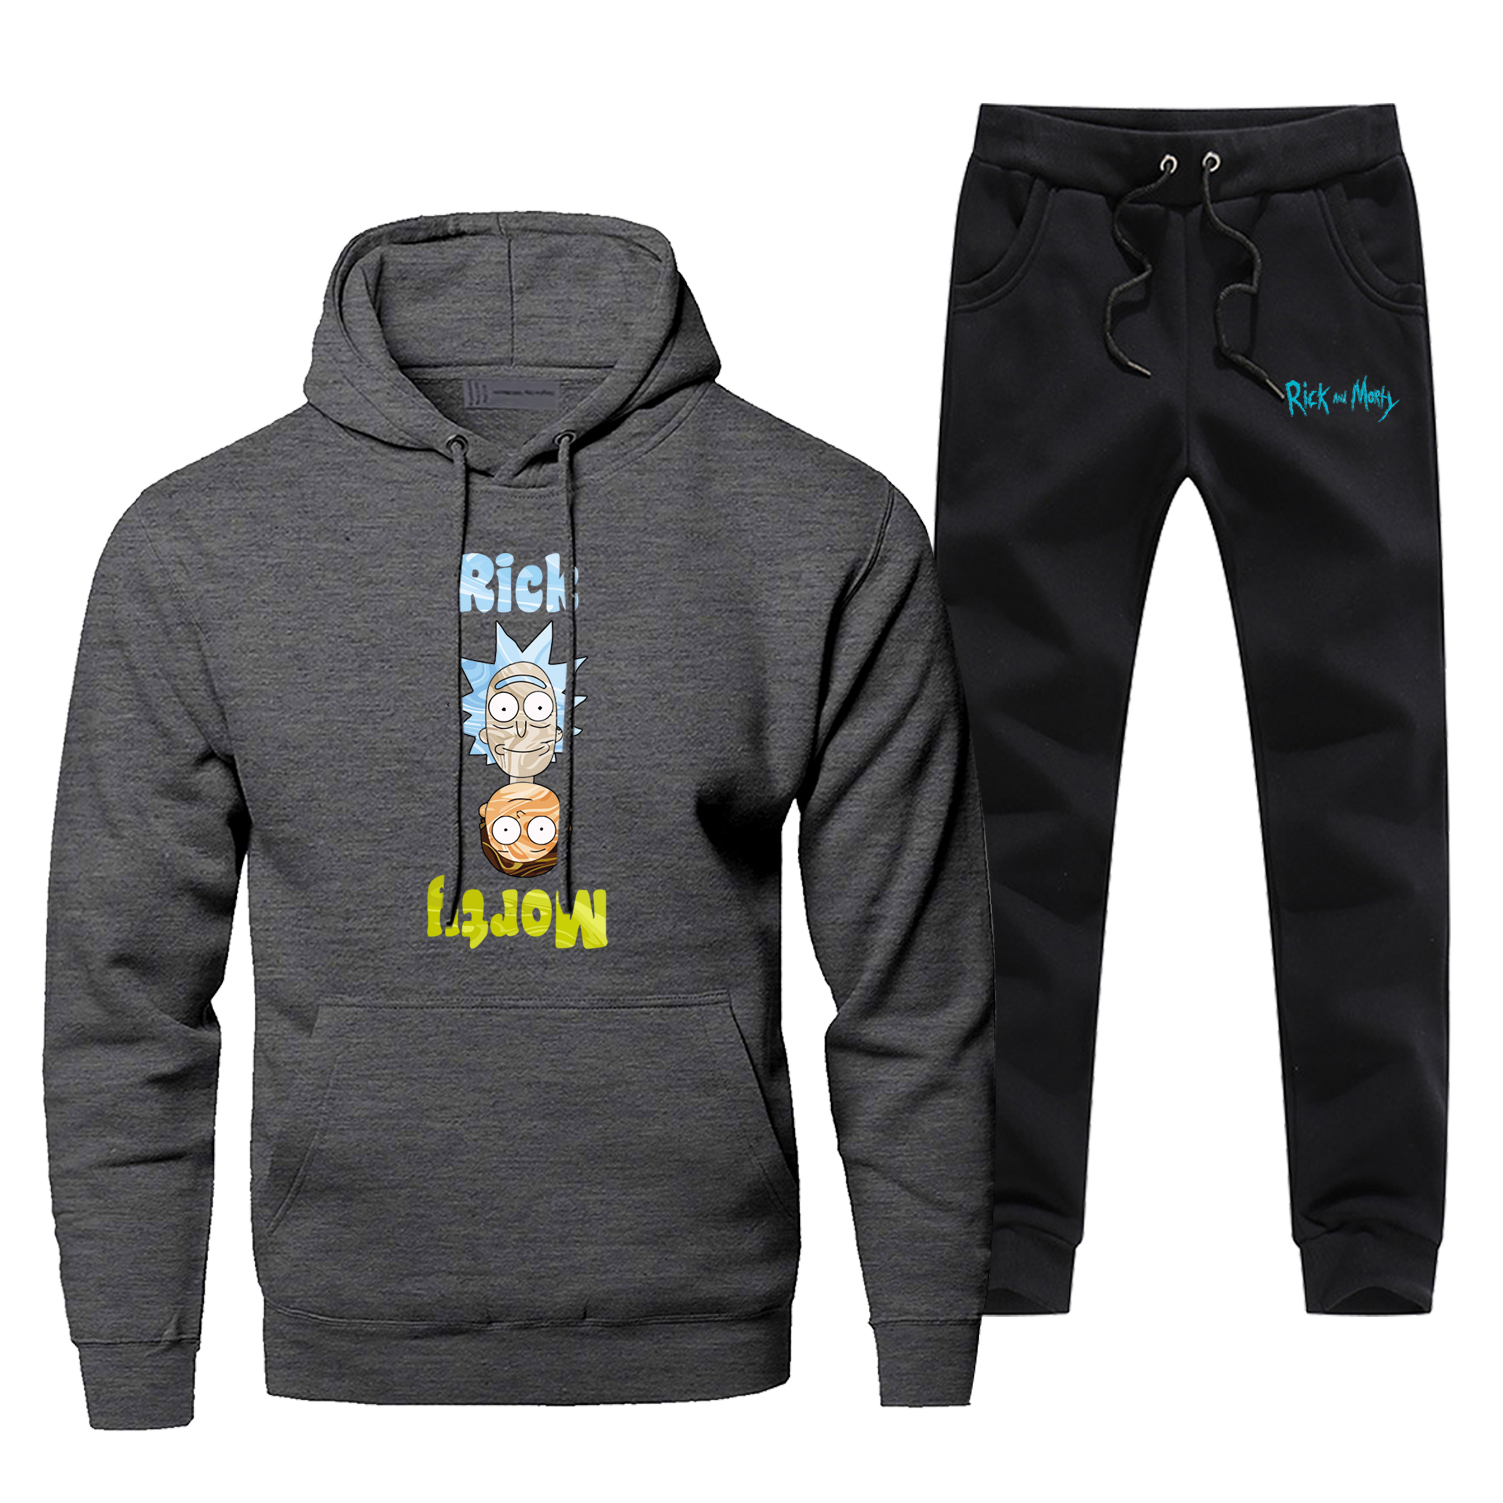 Men Hoodie Rick And Morty Male Pants Set Sweatshirt Mens Hoodies Sweatshirts Sets Two Piece Pant Pullover Funny Cortoon Coat